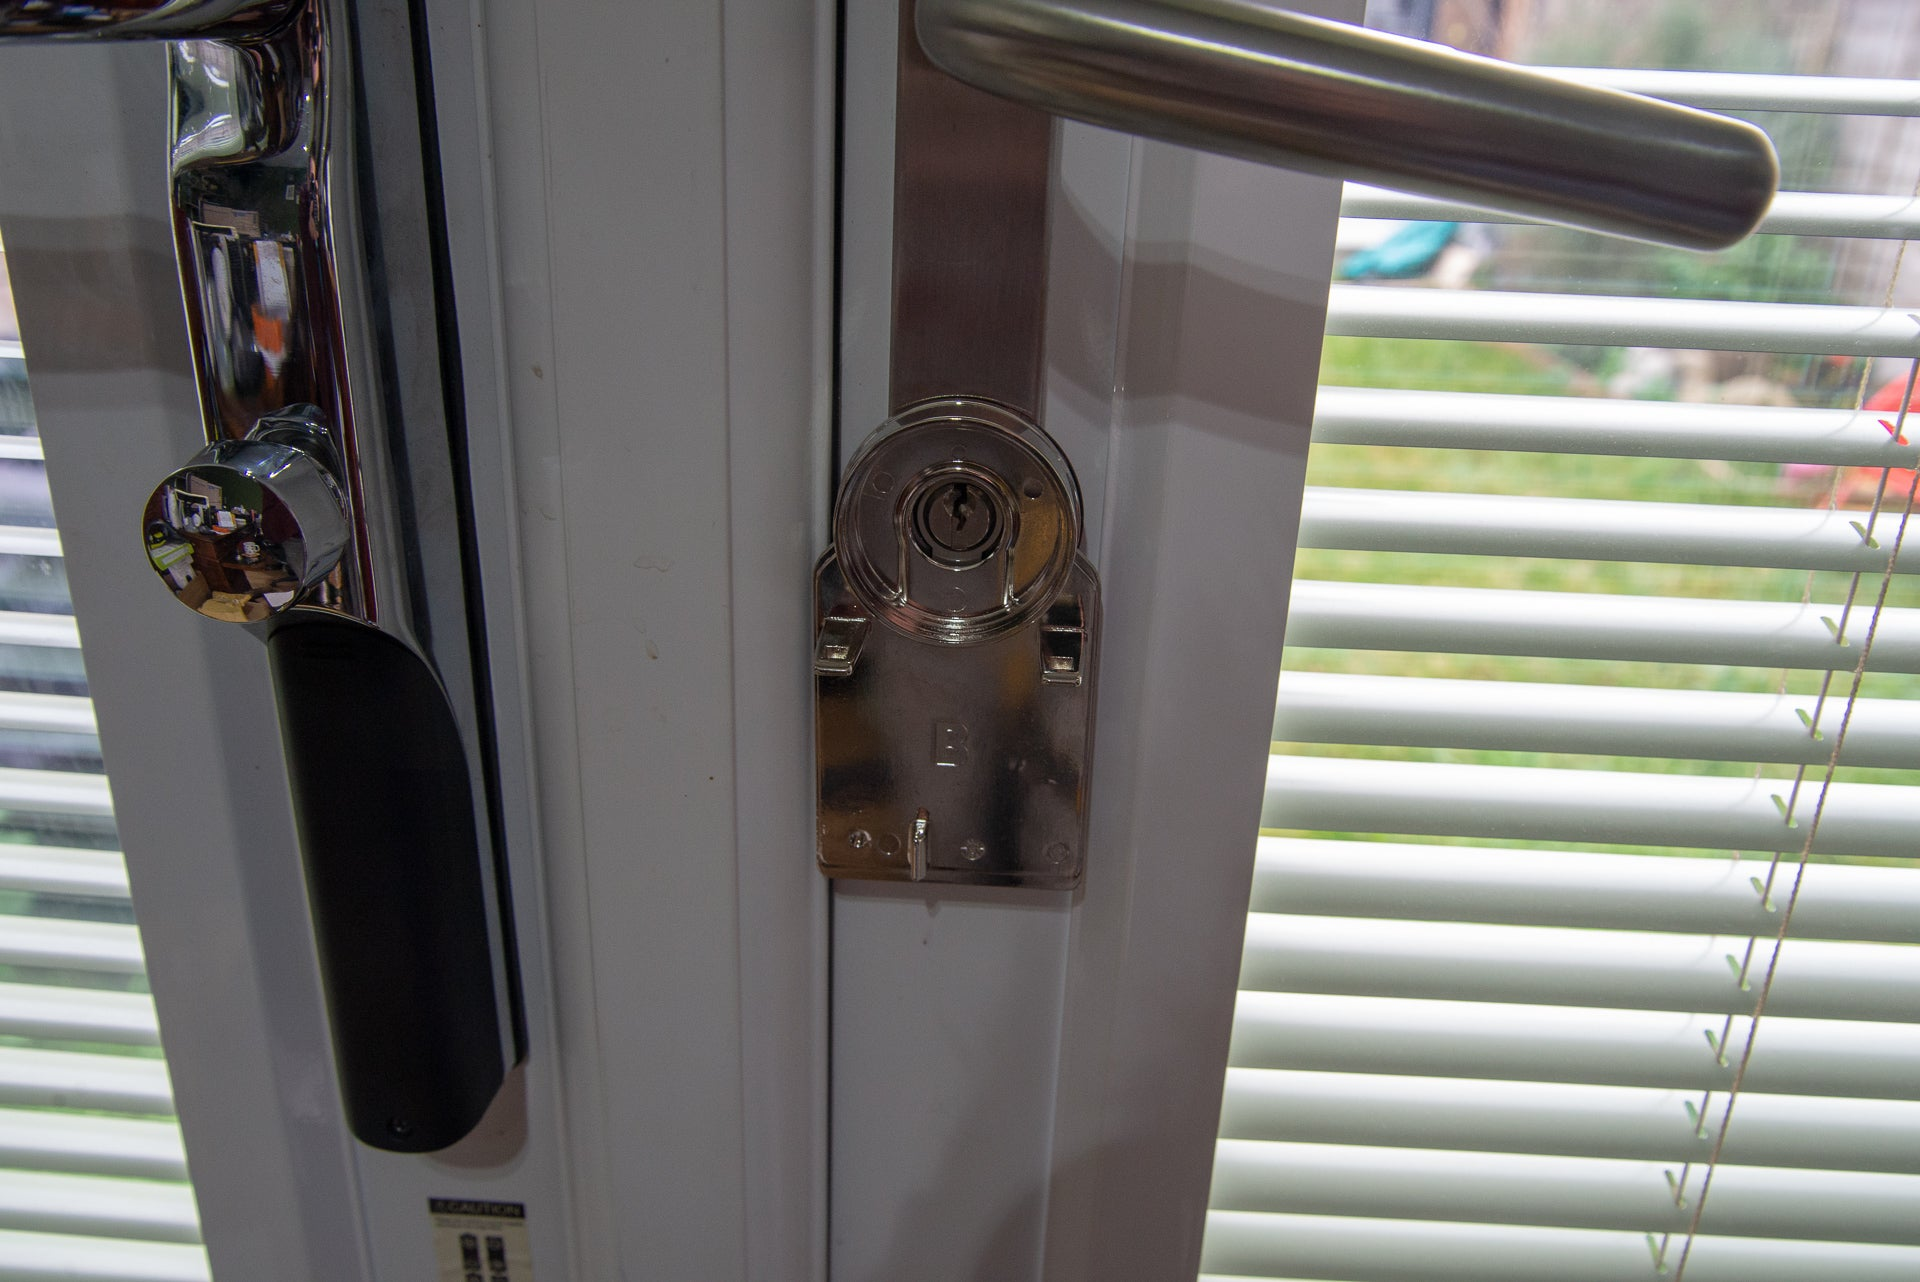 Nuki Smart Lock 2.0 mounting plate